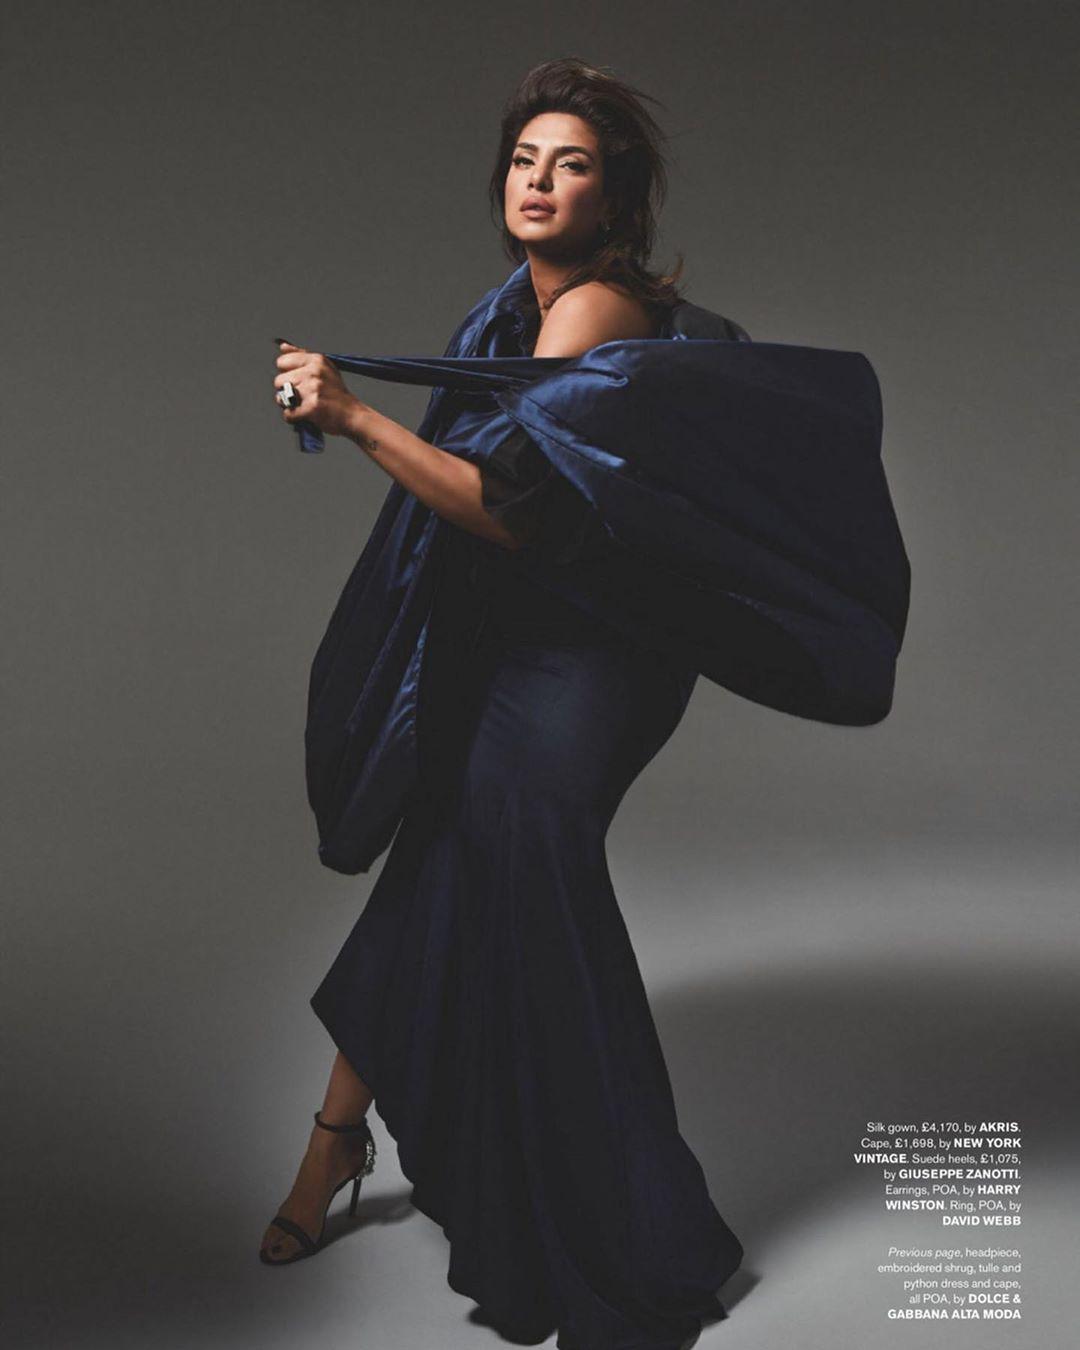 Priyanka Chopra, Tatler, Pattie Yankee, Celestine Agency